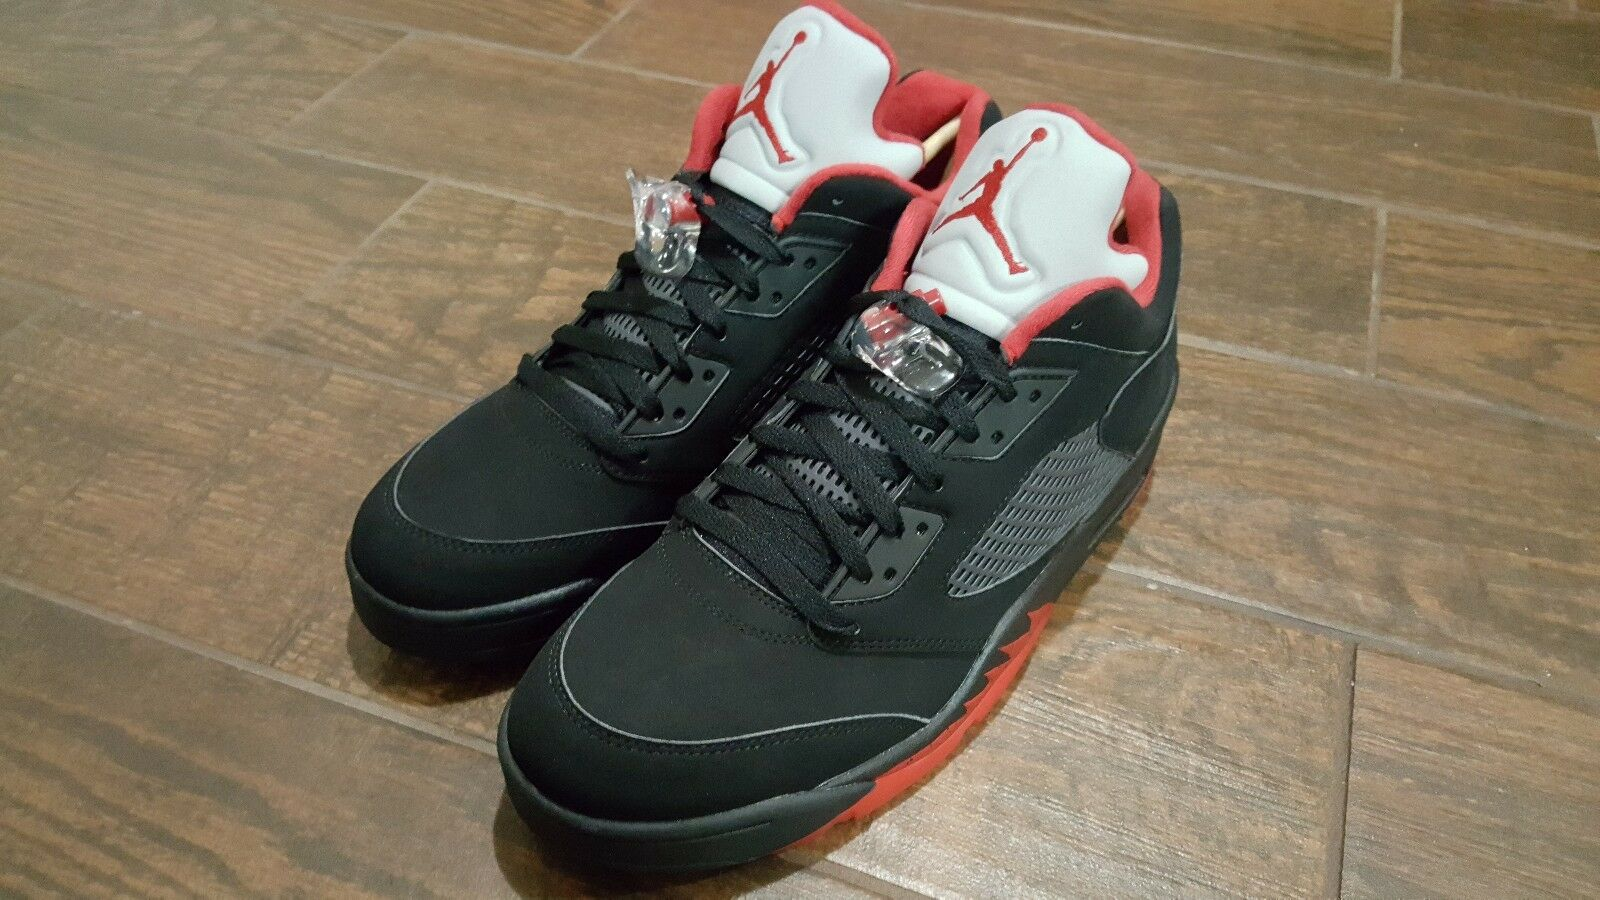 Brand New Air Jordans 'Breds' Retro 5's size 12